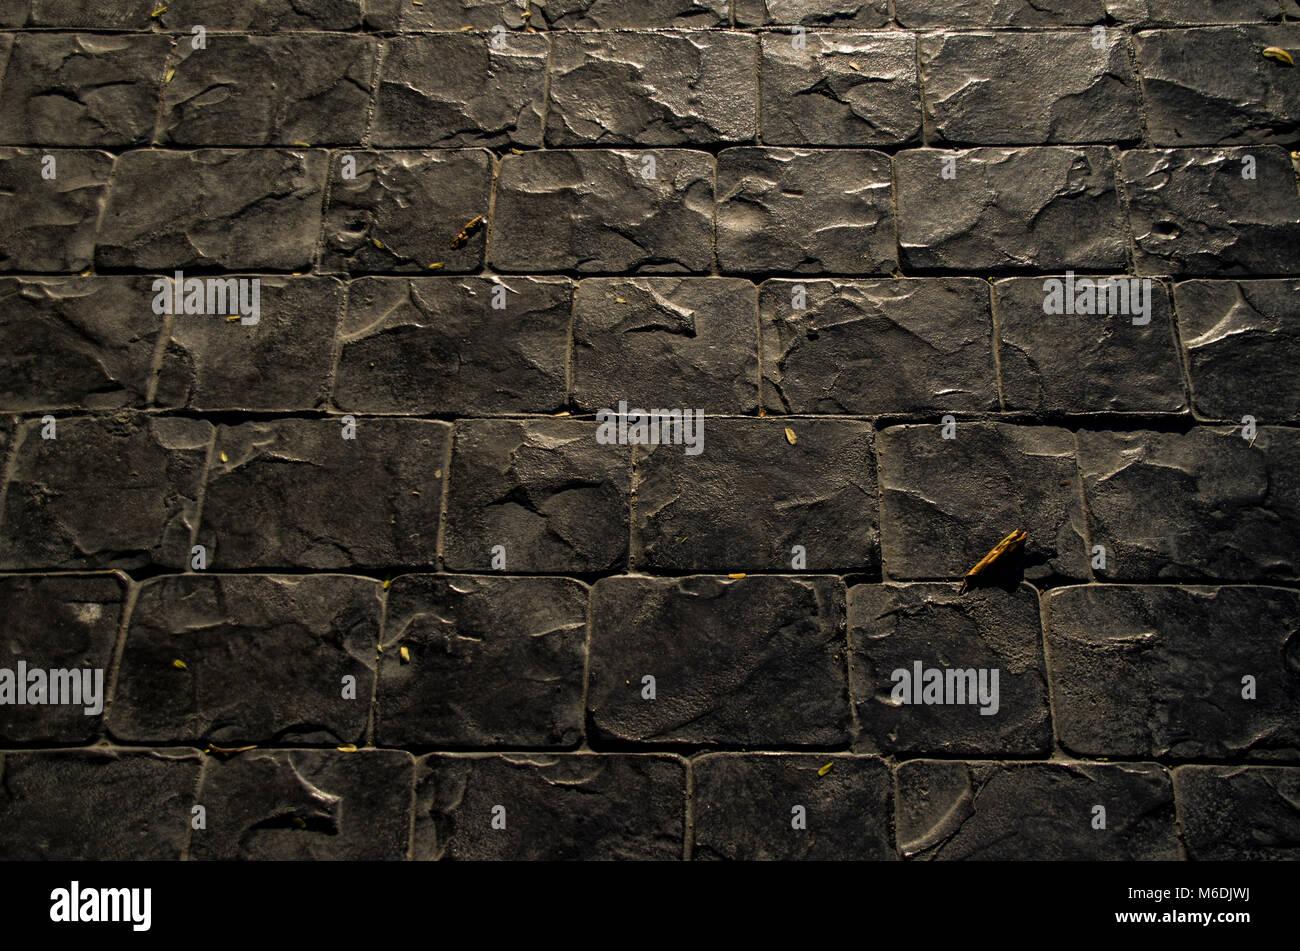 Black Brick Texture For 3d And Illustration Design Wallpaper